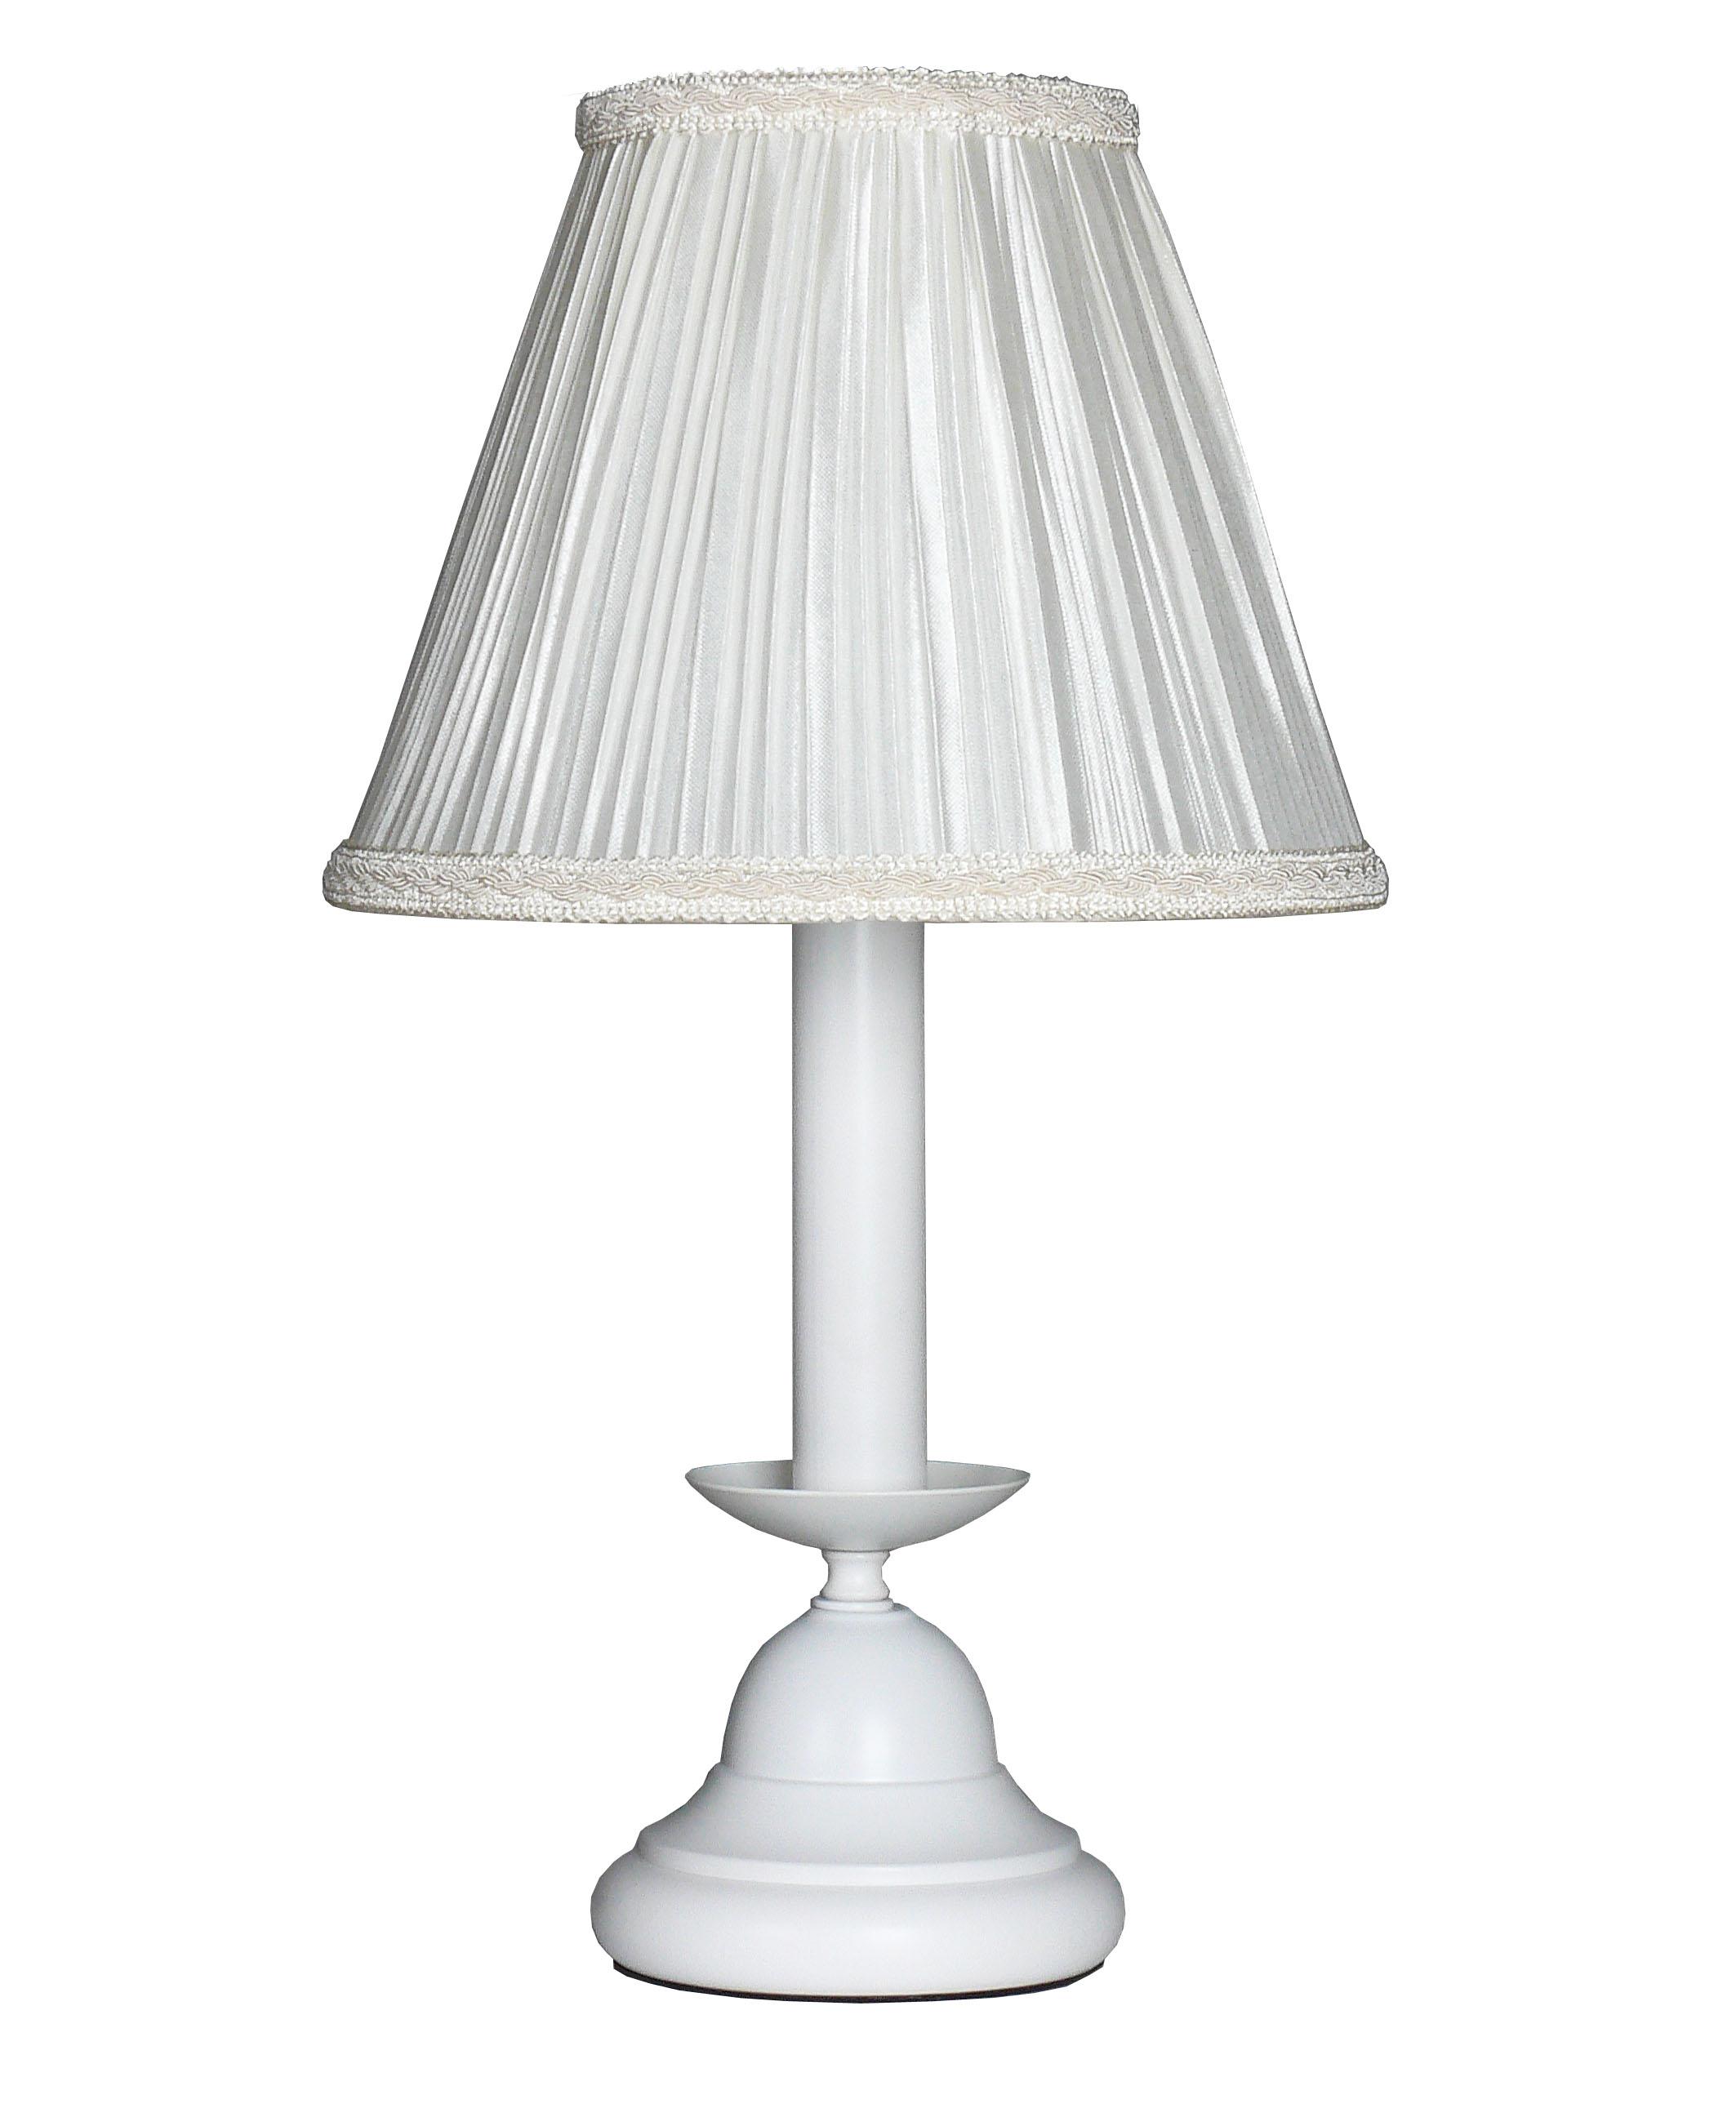 Лампа настольная АВРОРА Корсо 10027-1n аврора бра корсо 10027 1b